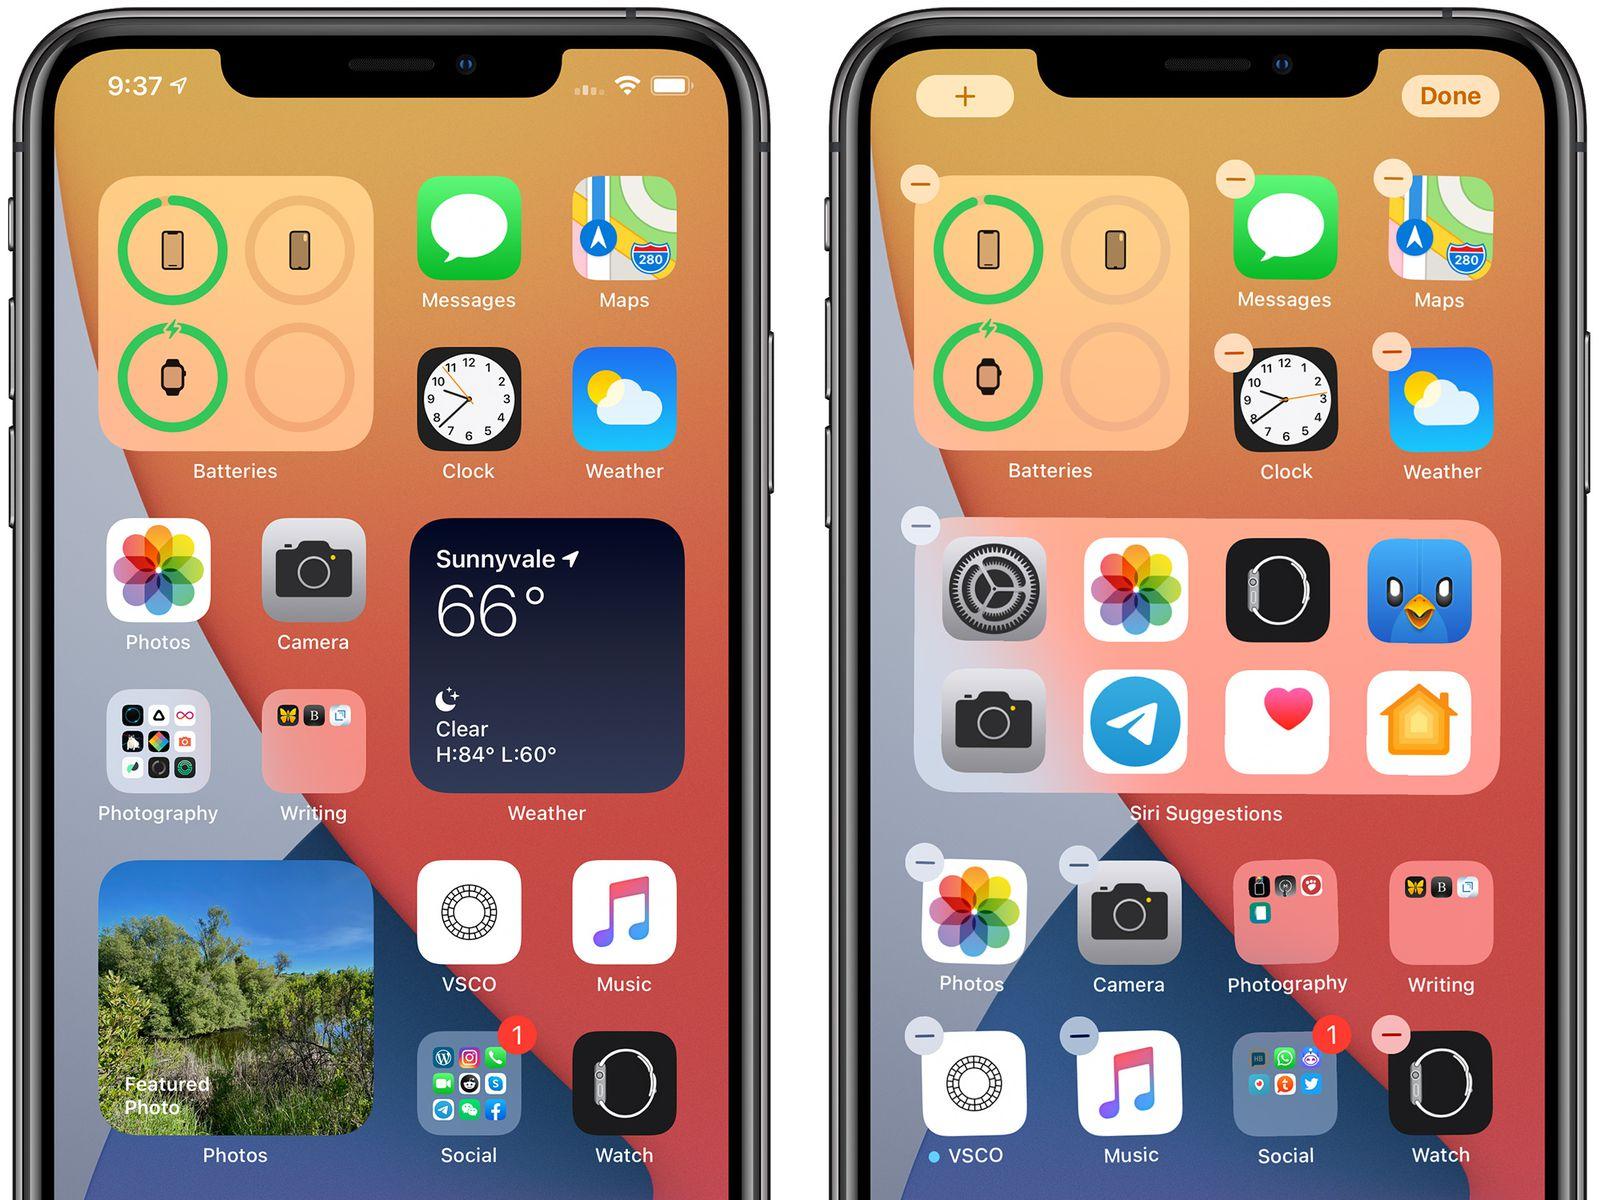 How to Use Widgets in iOS 14 - MacRumors